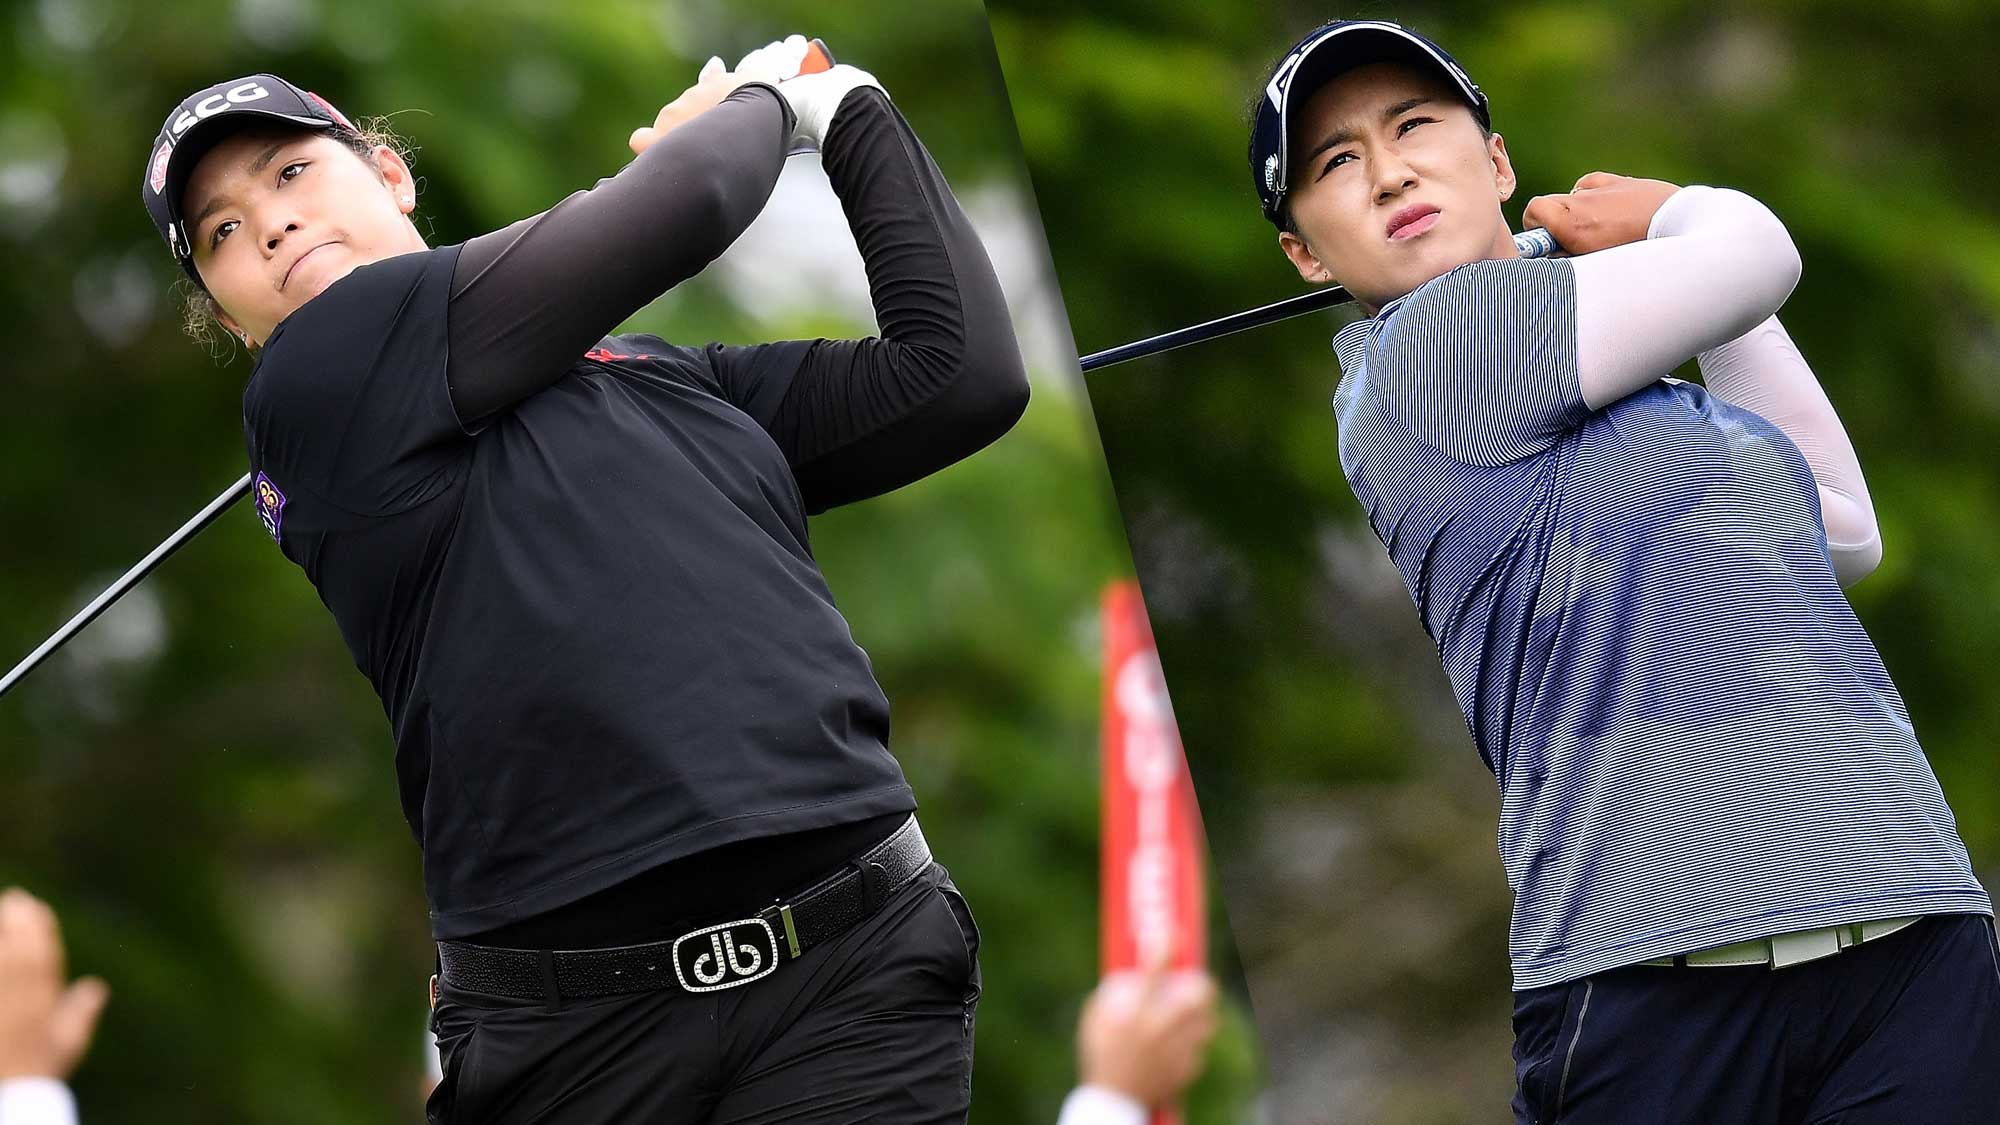 2018 honda lpga thailand.  thailand ariya jutanugarn and amy yang share the opening round lead in thailand on 2018 honda lpga thailand t